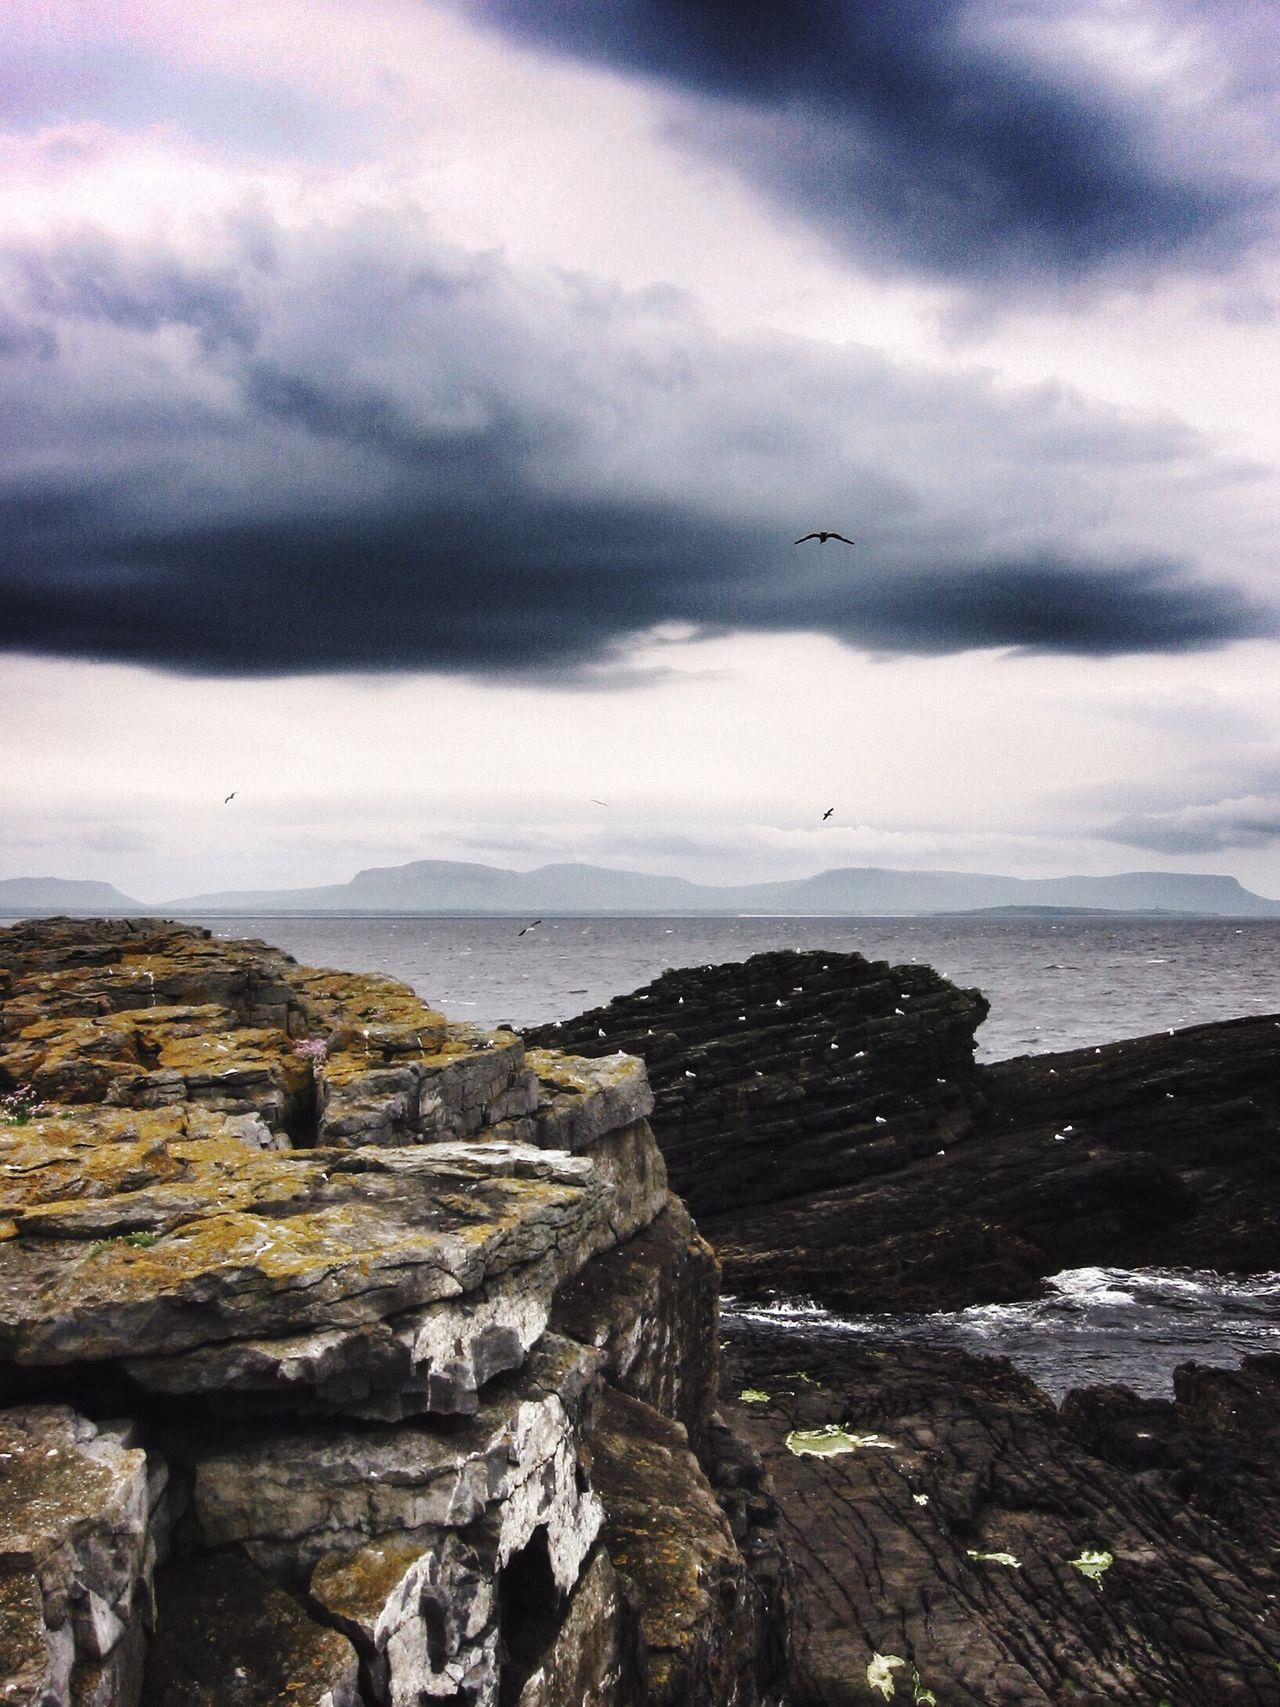 The Burren Ireland Irish Landscape Coast Cliffs Weather Dramatic Dramatic Sky